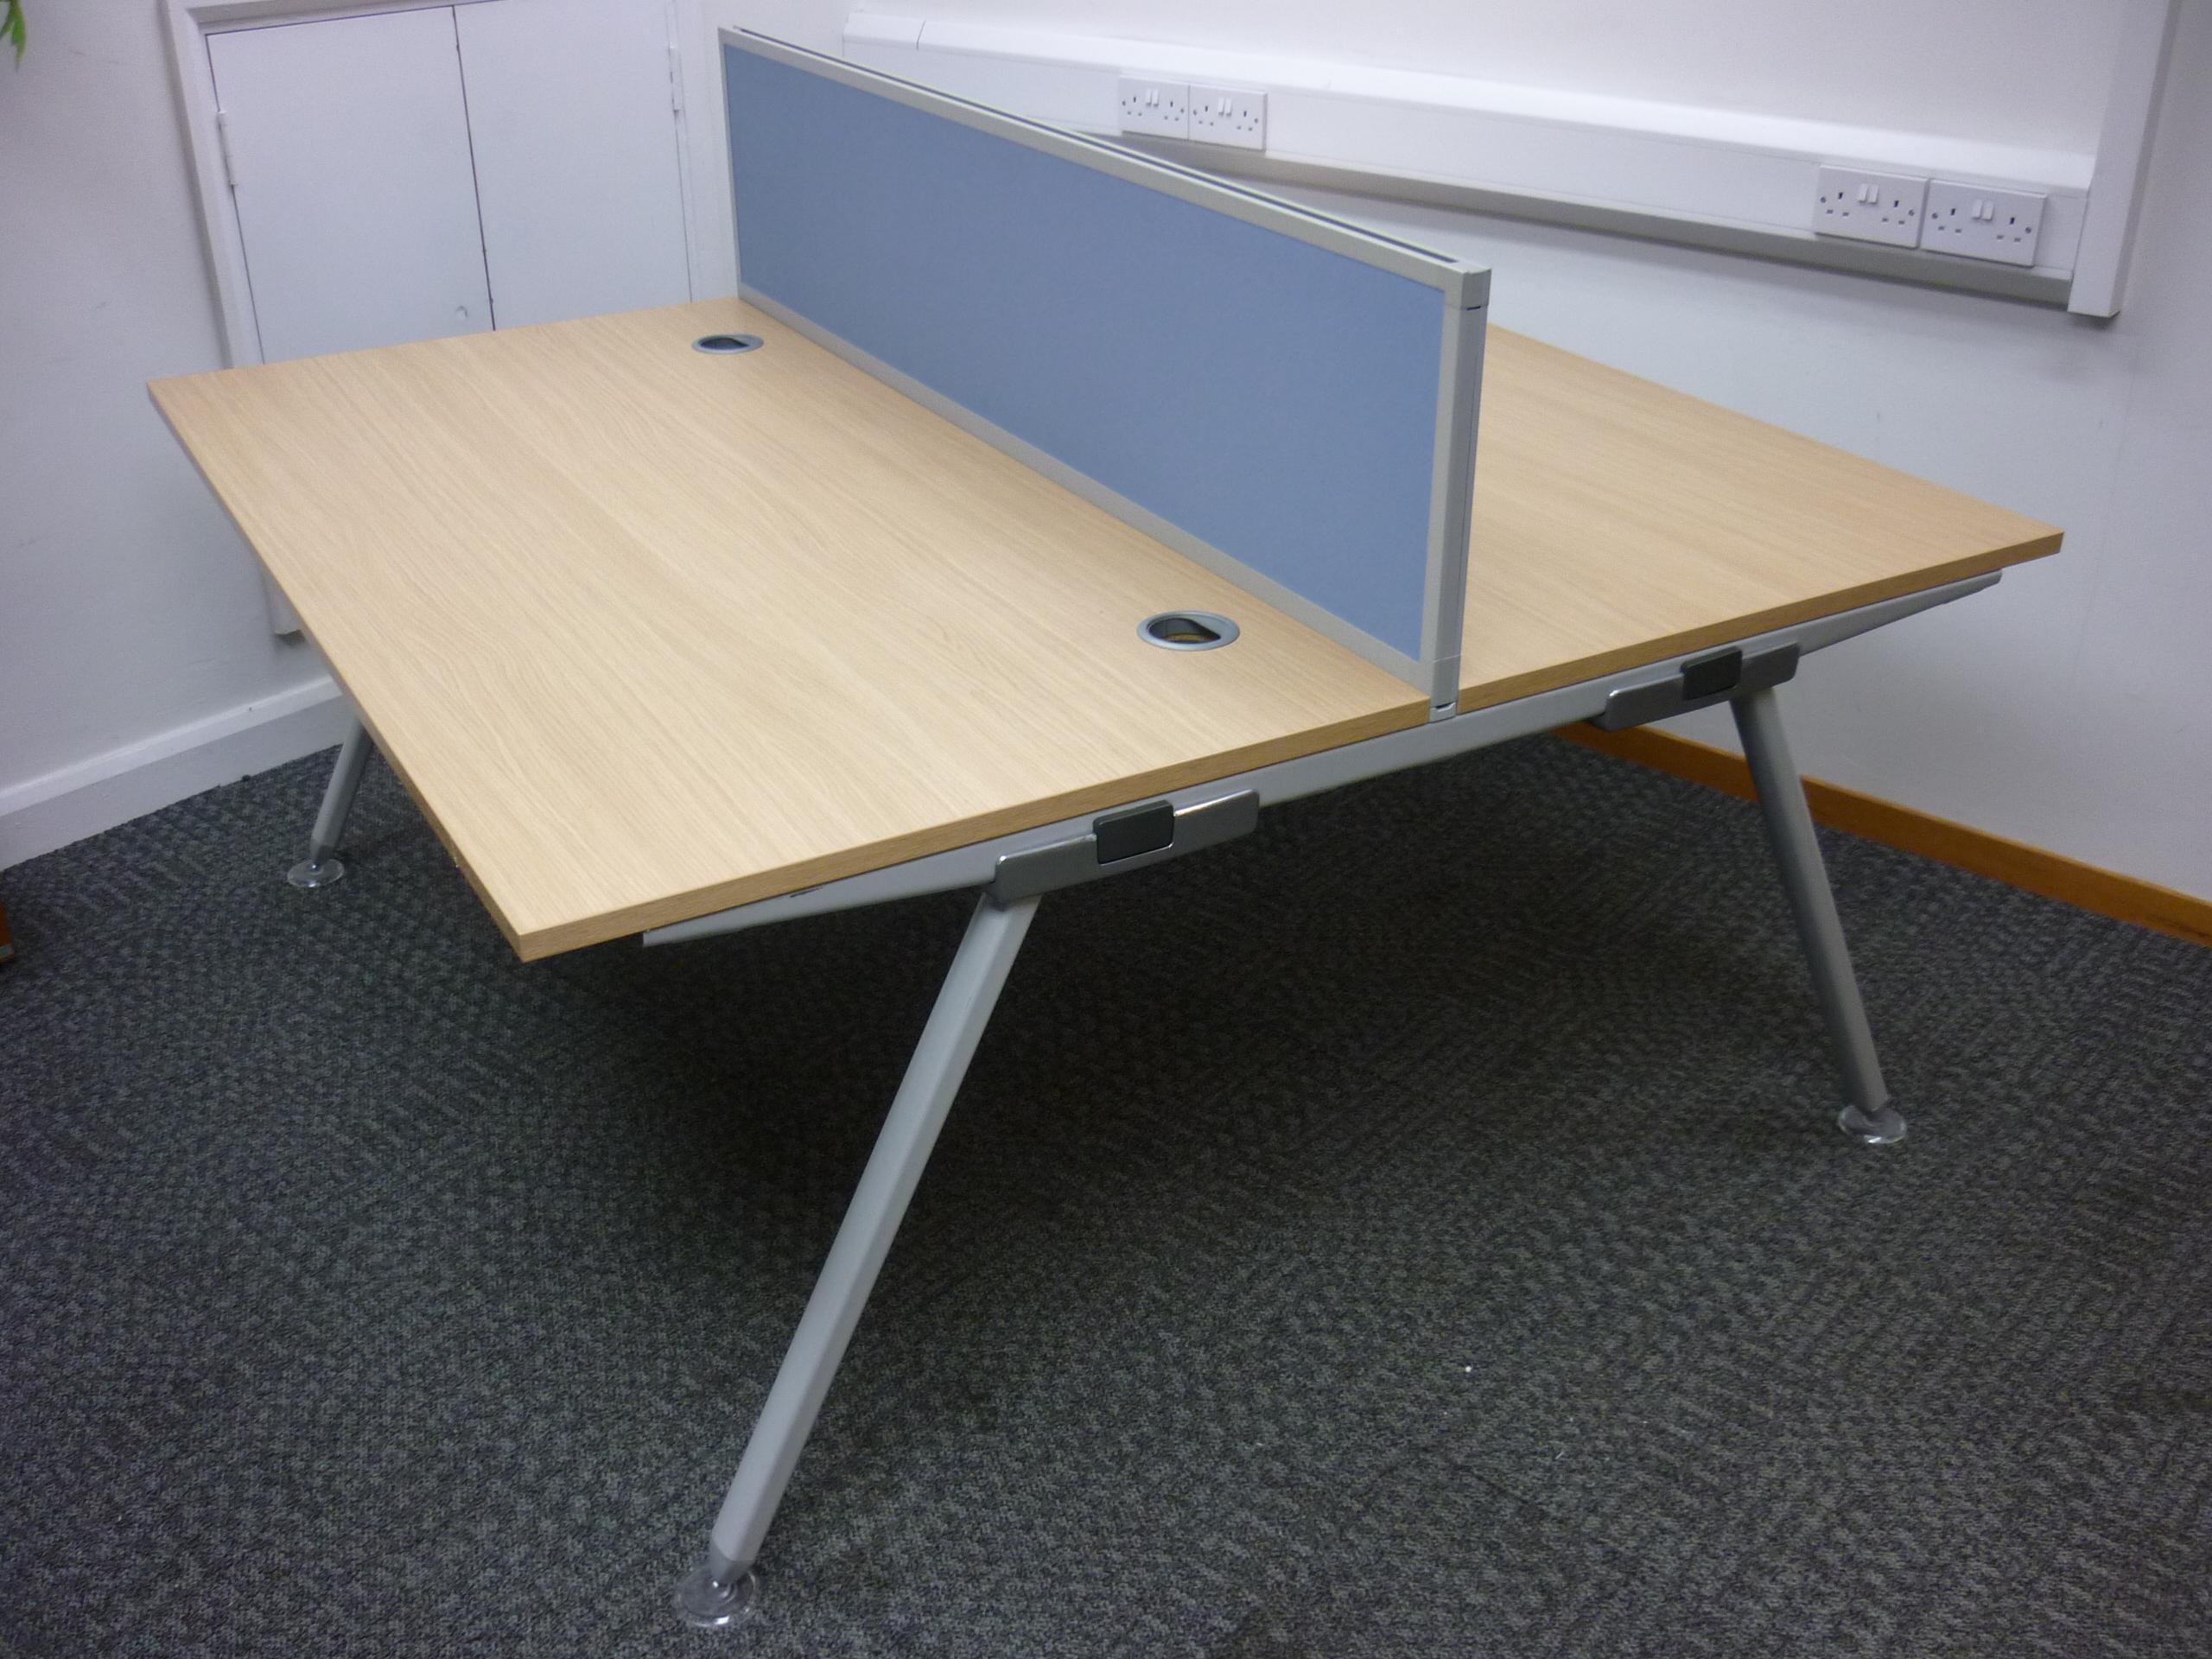 1600w x 800d mm Oak Senator Core bench desks (CE) price per user